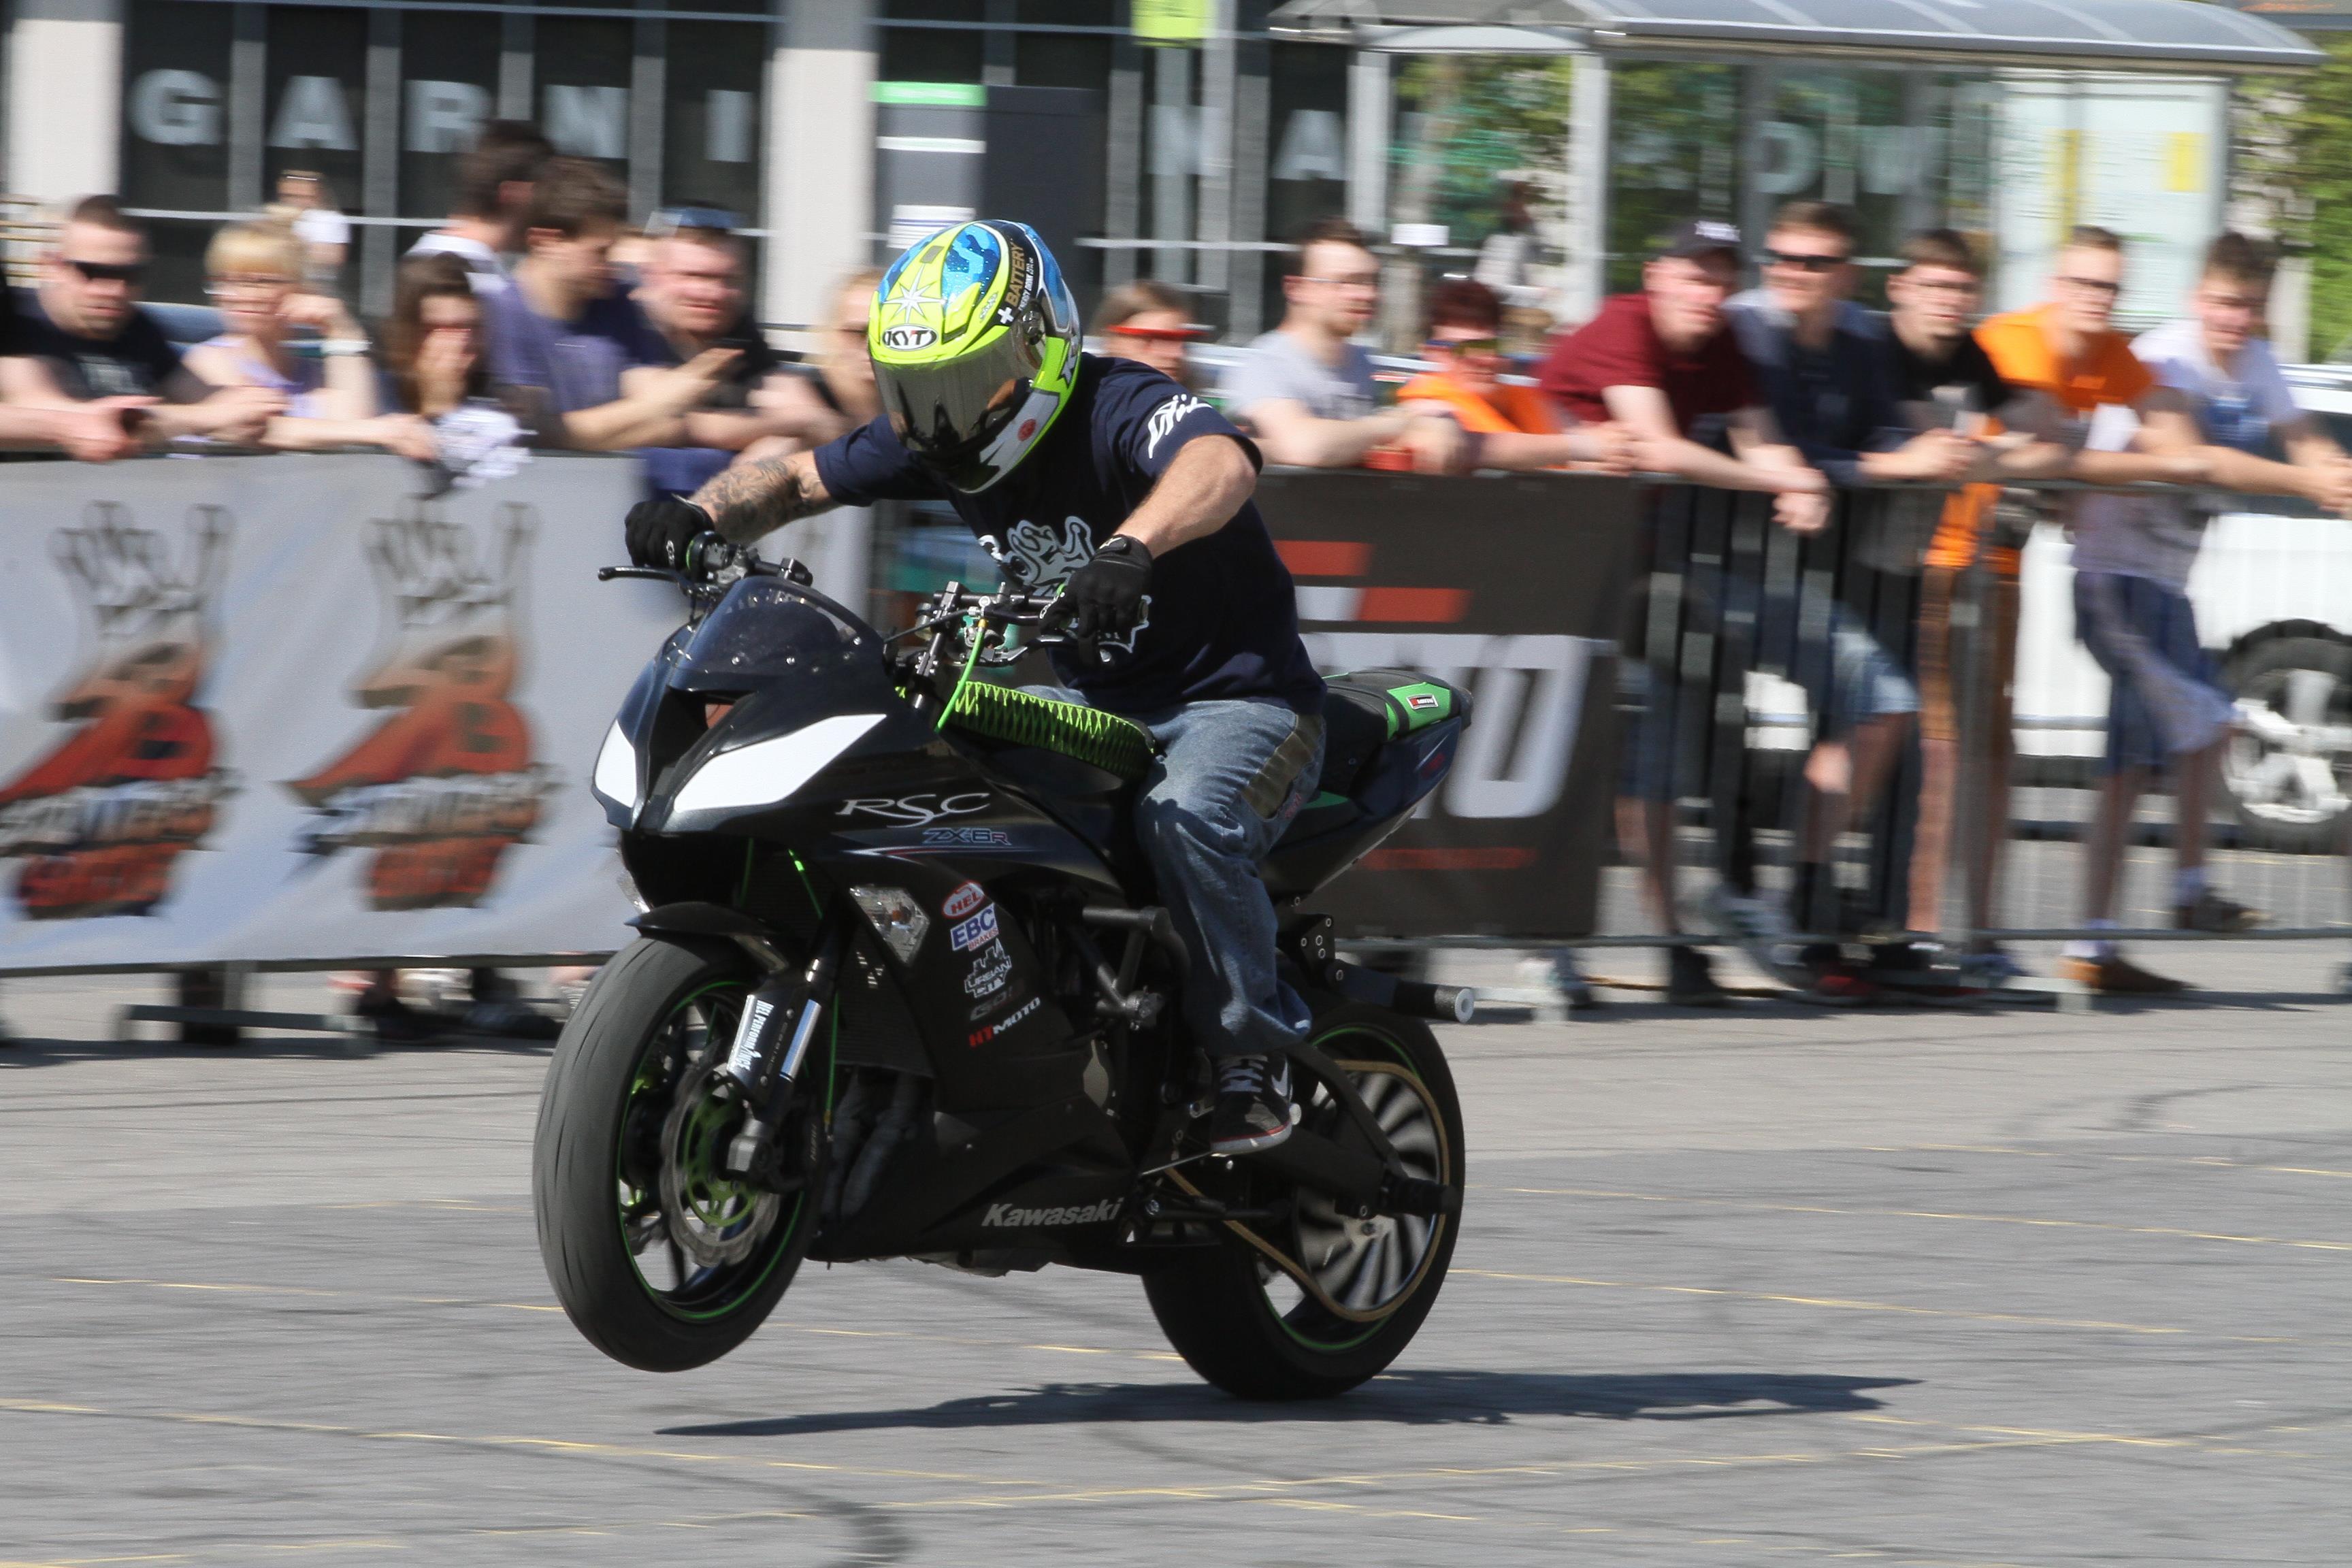 Stunters Battle  Olsztyn -  Stunters Battle, tzn. pokaz stuntu motocyklowego podczas olsztyńskich juwenaliów.